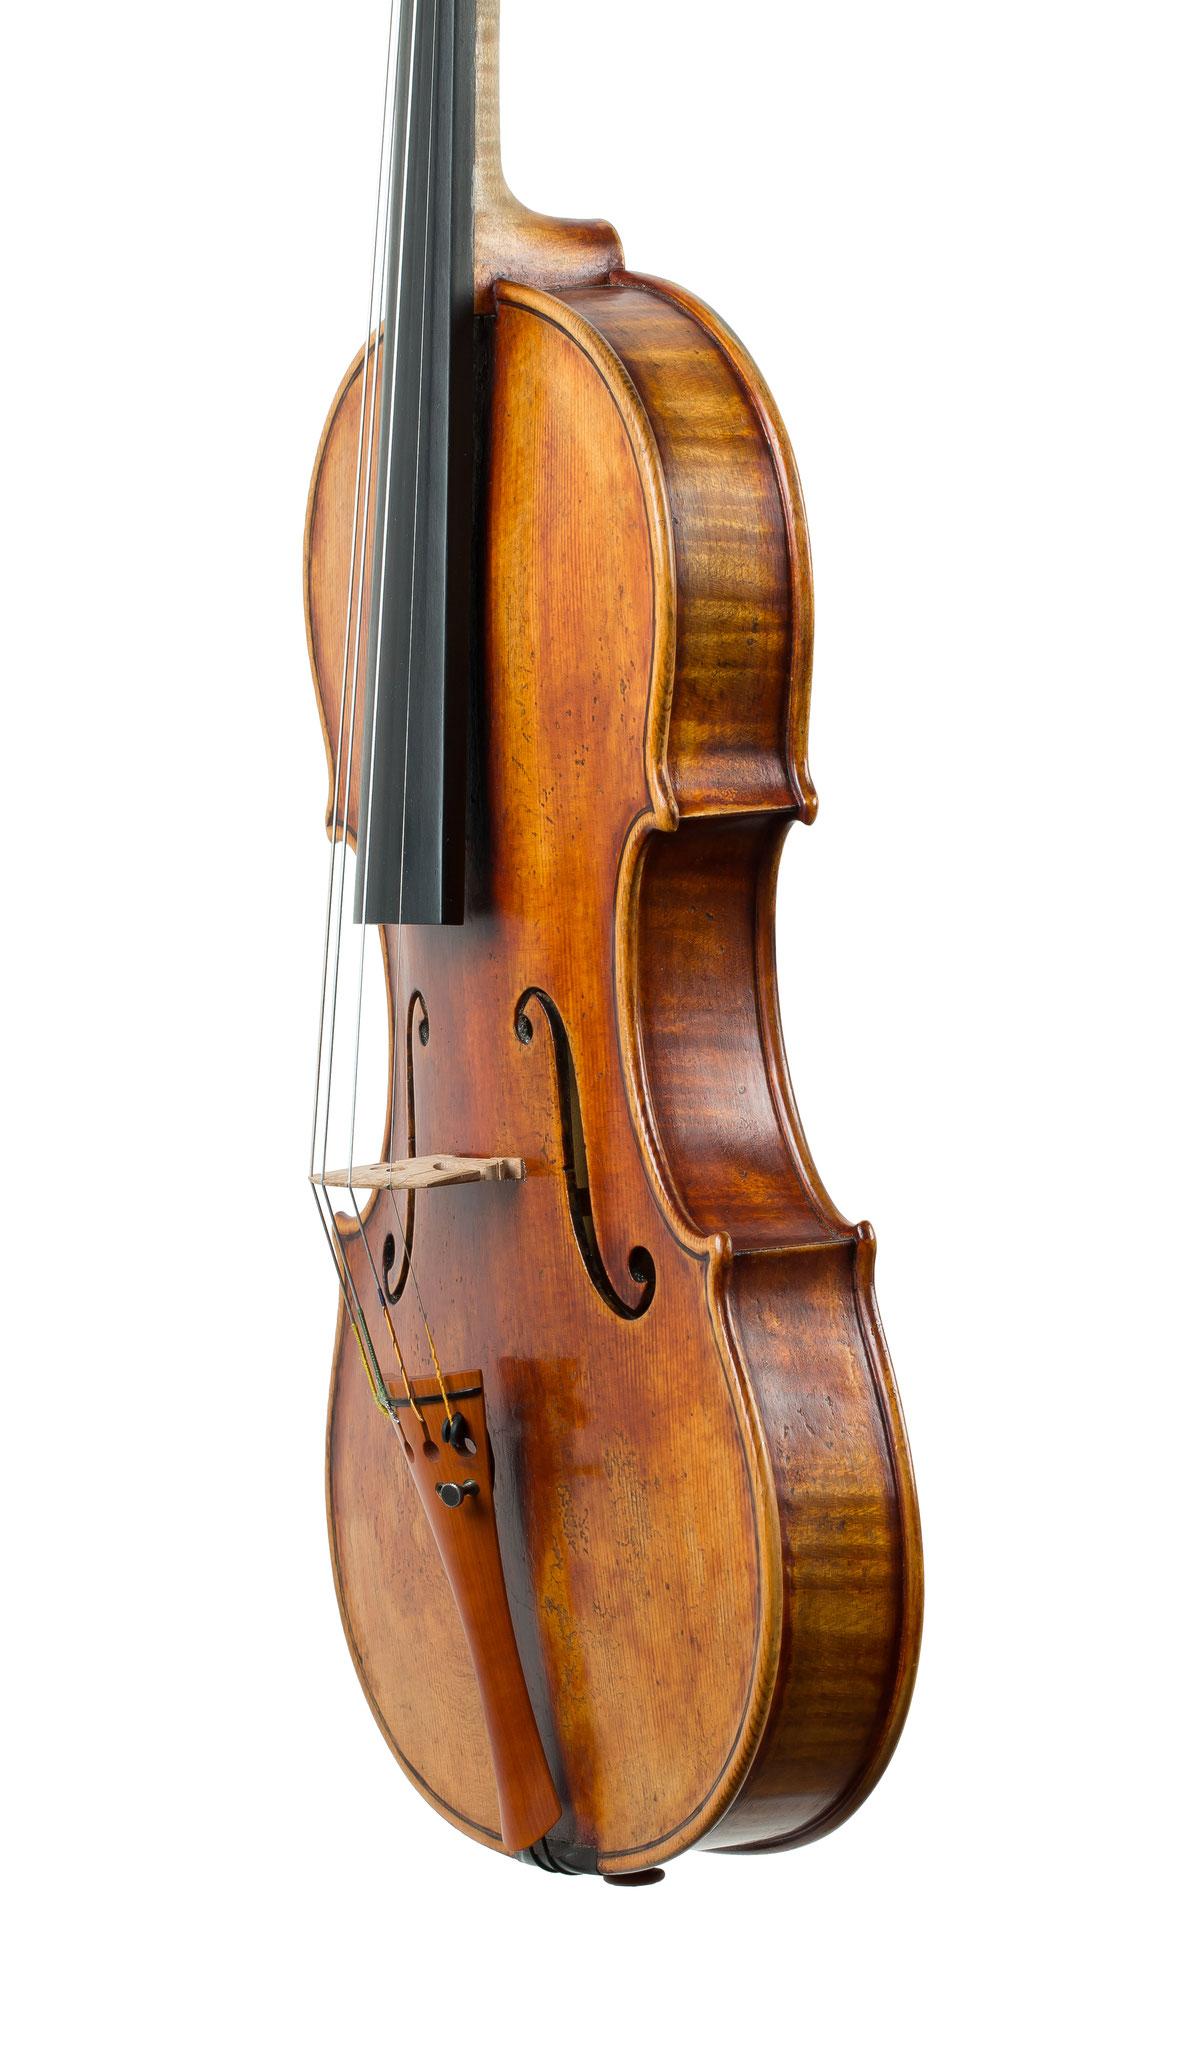 Violin after Guarneri del Gesù 1742 (2015/CH), Photo: VDB Photography